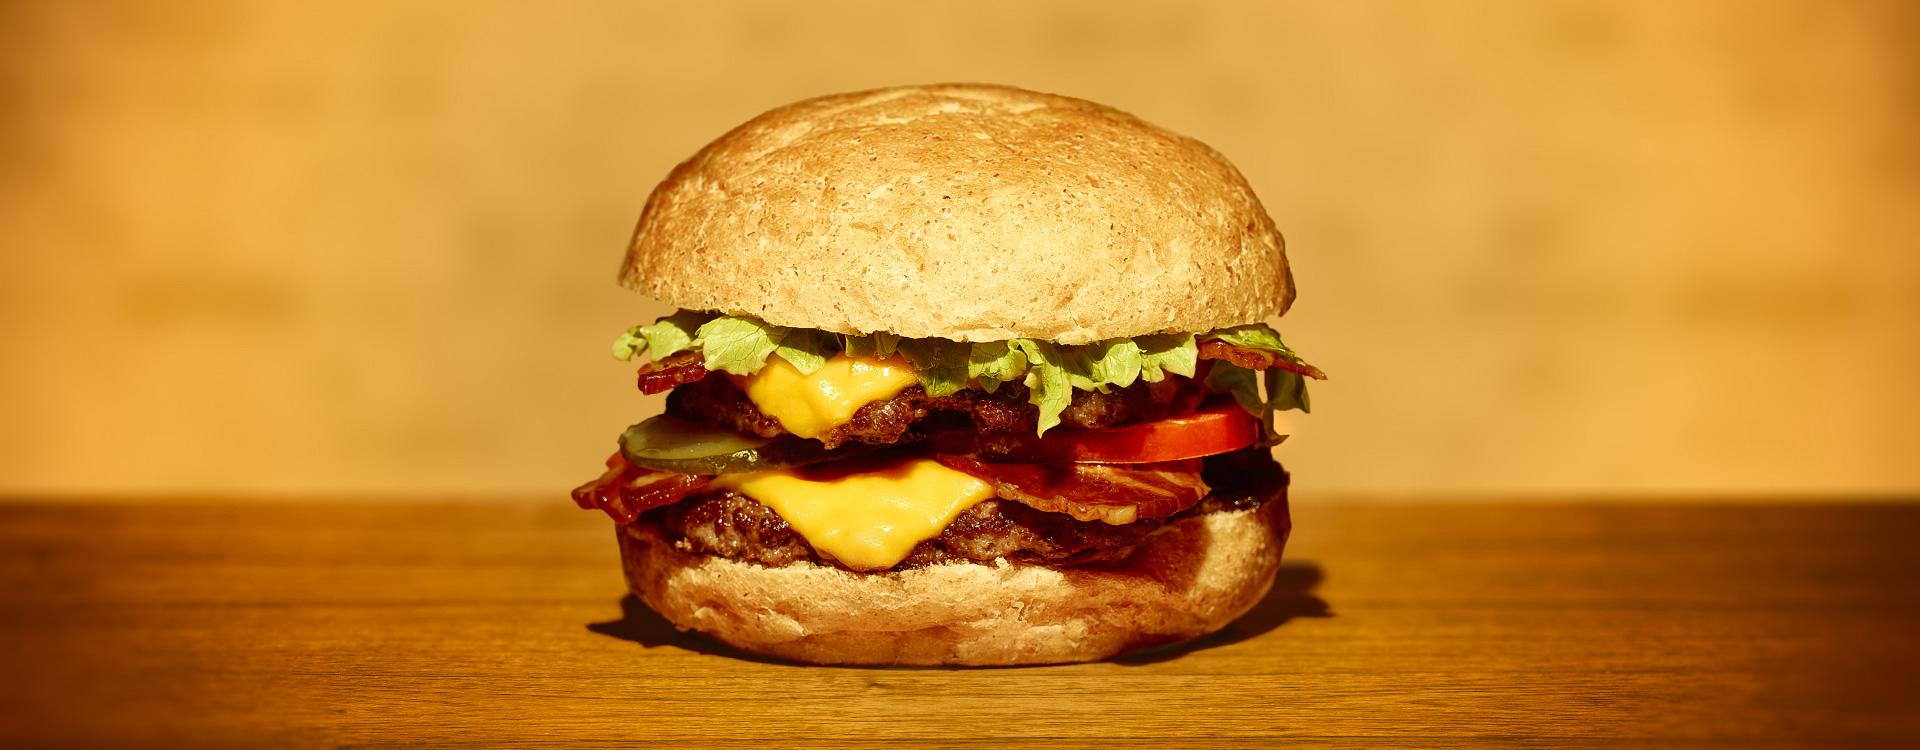 Young Burger